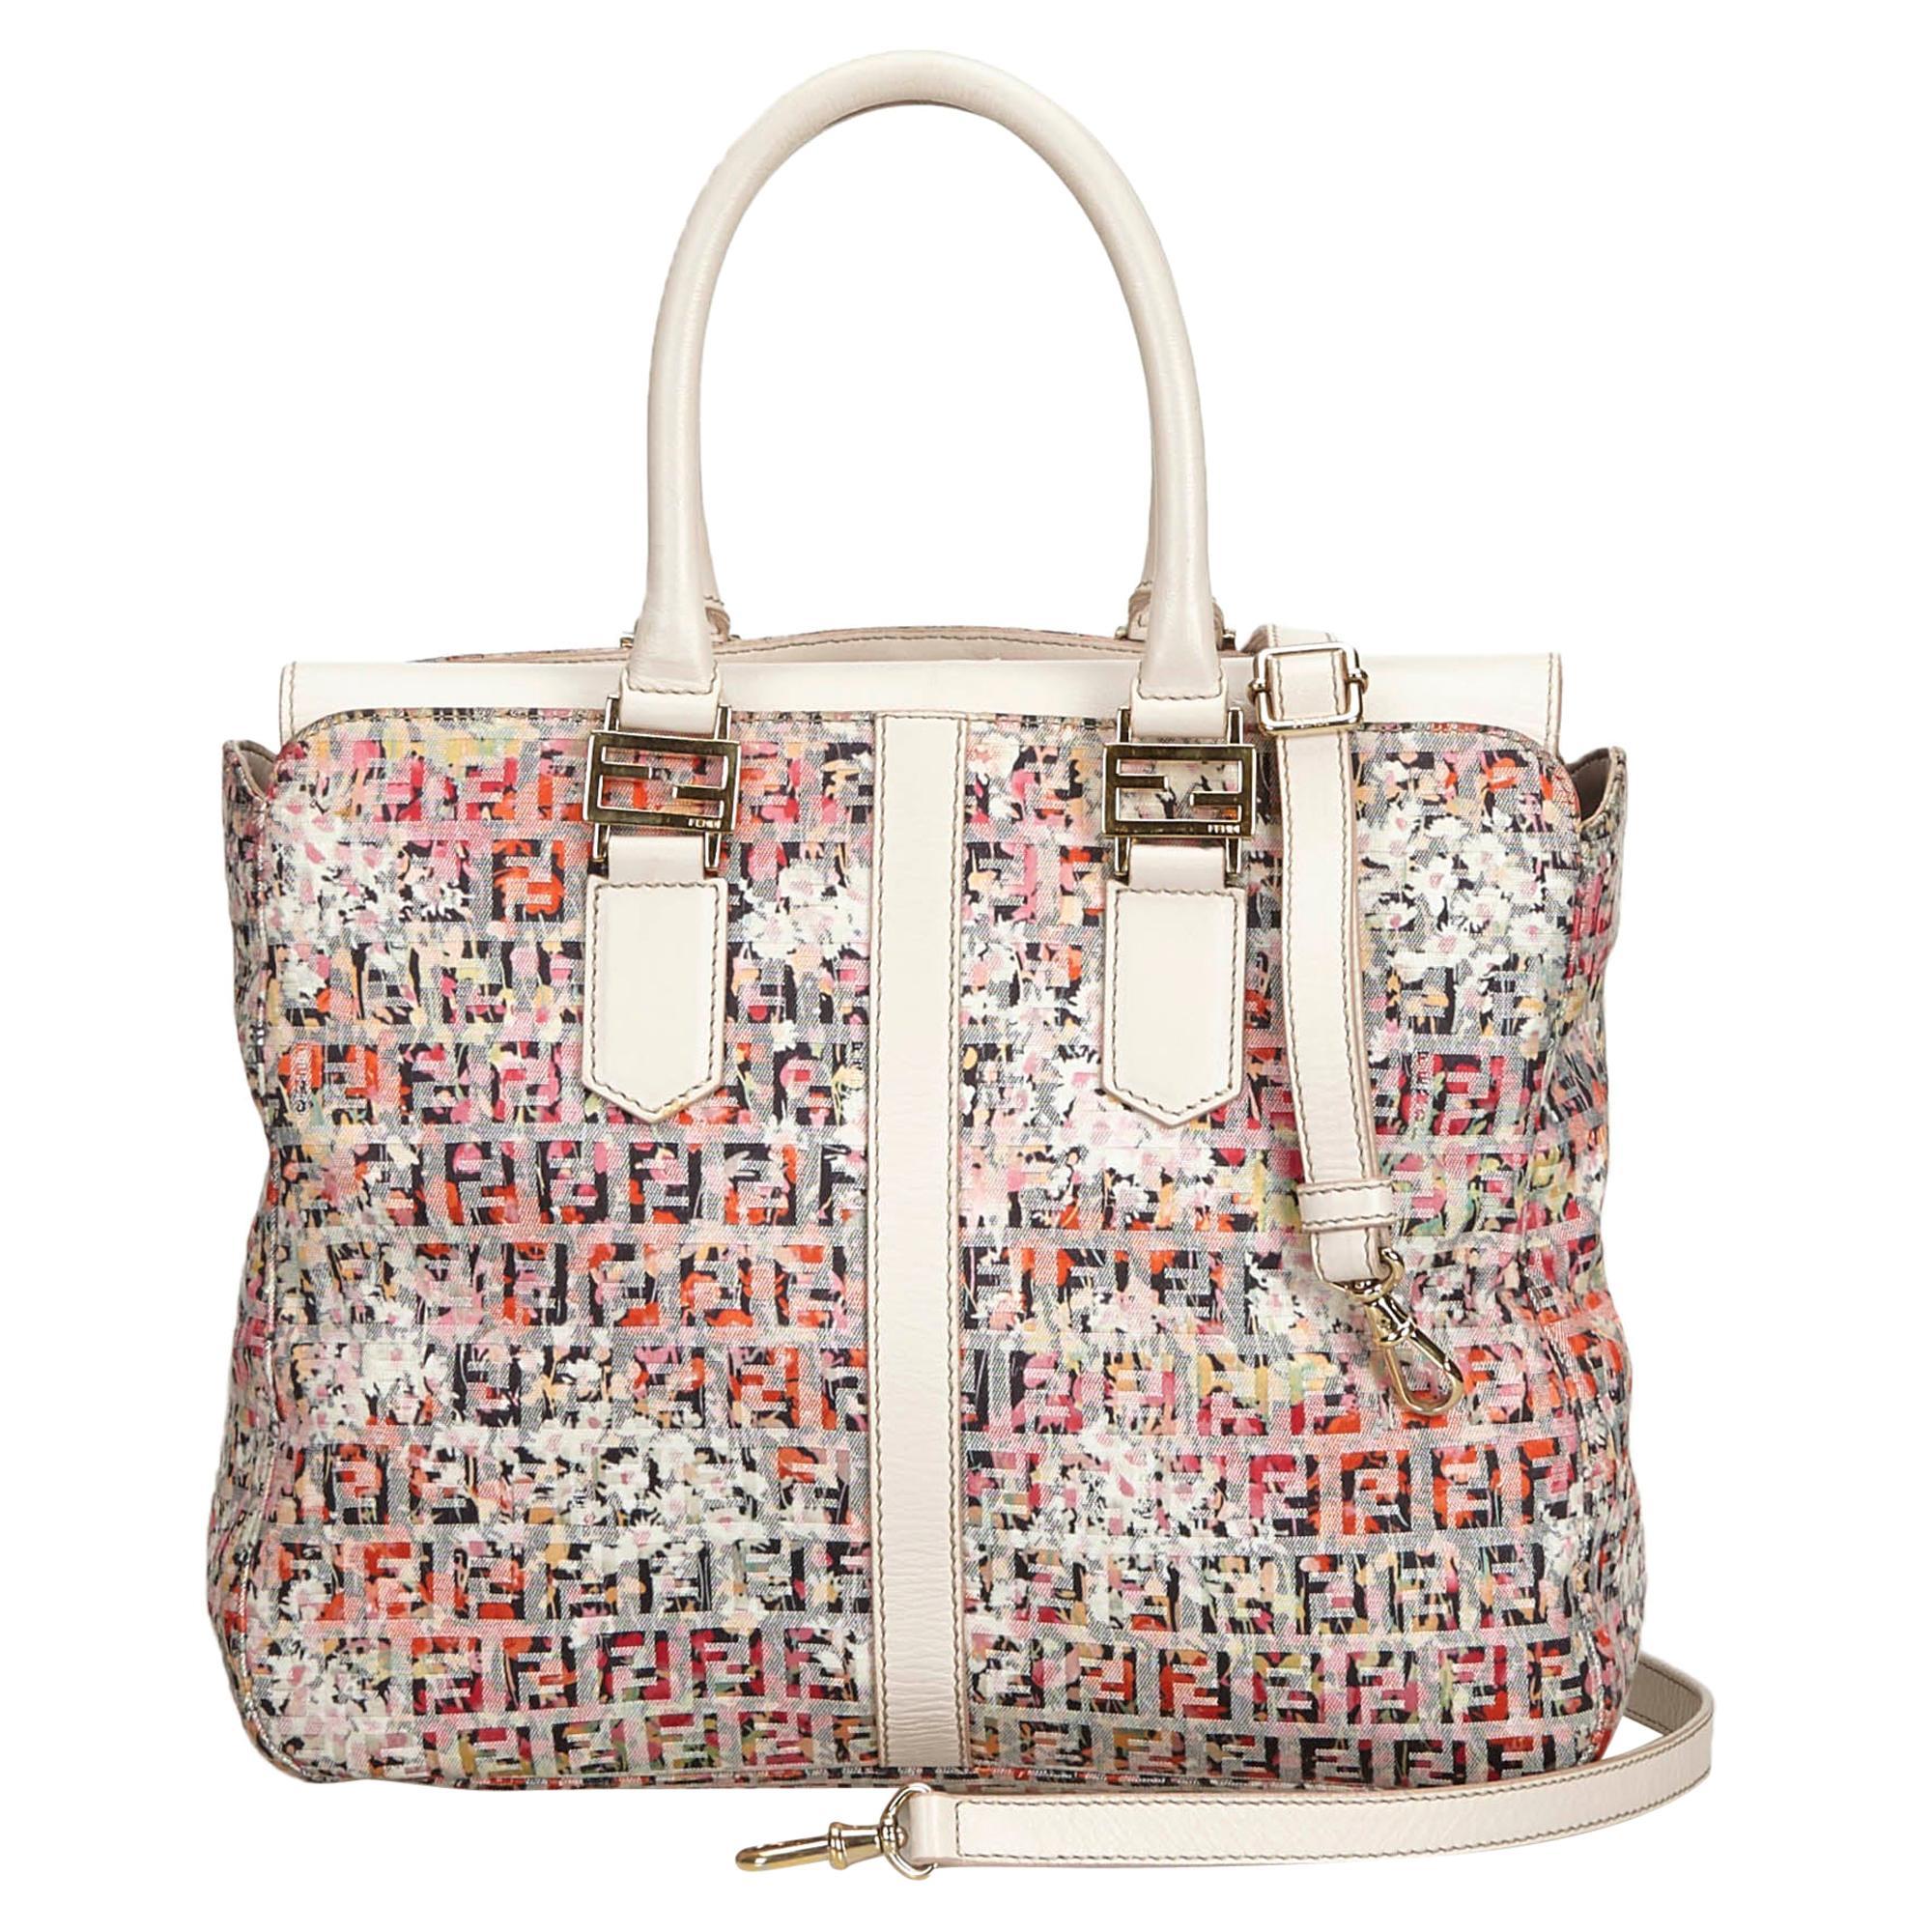 02c2429e2ee Vintage Fendi Handbags and Purses - 1,065 For Sale at 1stdibs